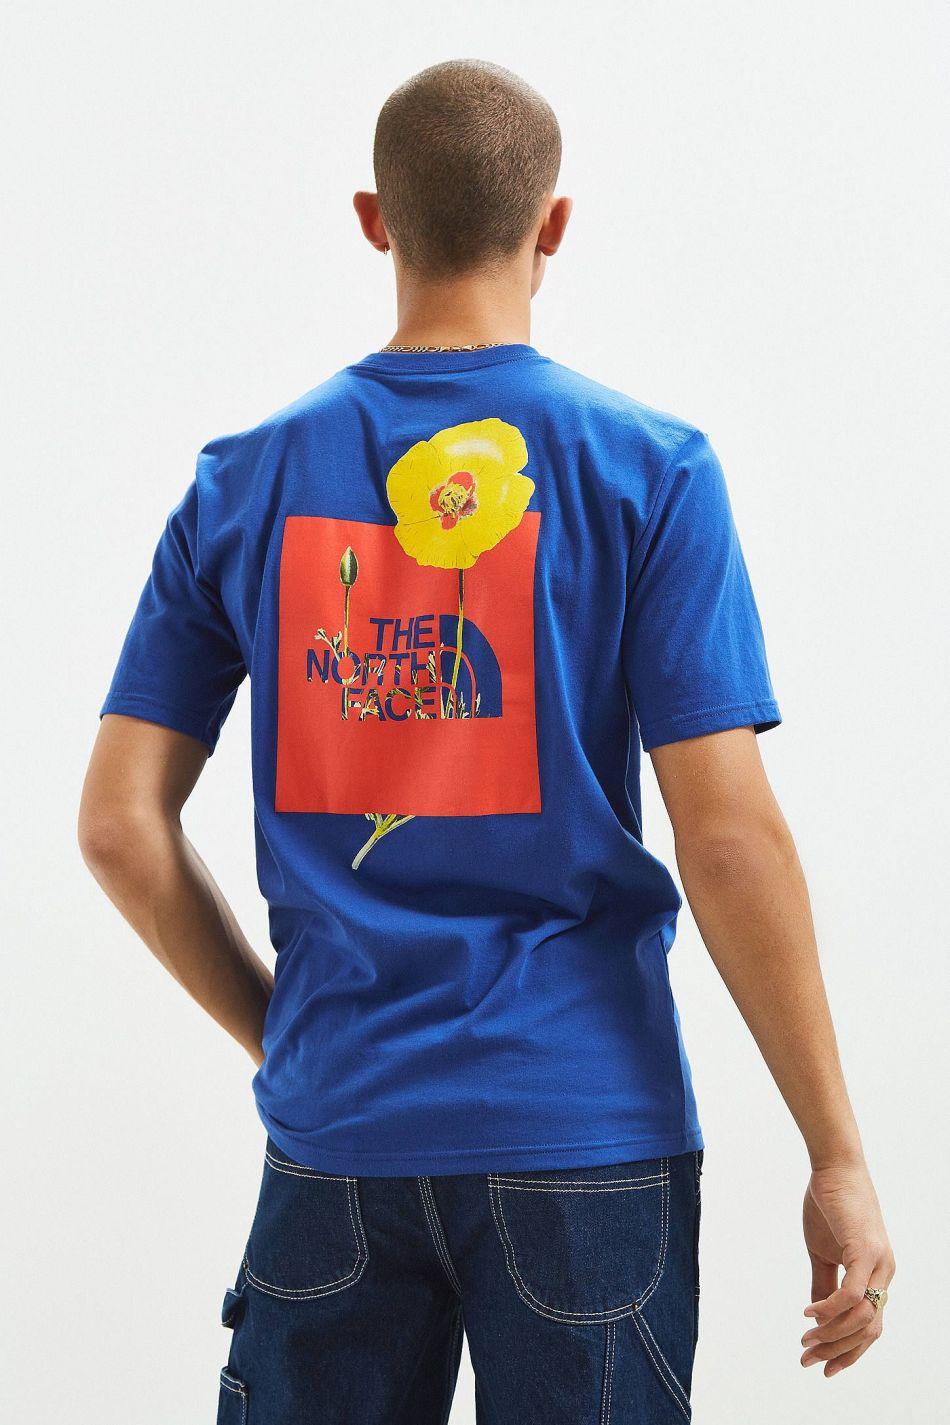 The North Face stellt Shirts aus recycelten Flaschen her